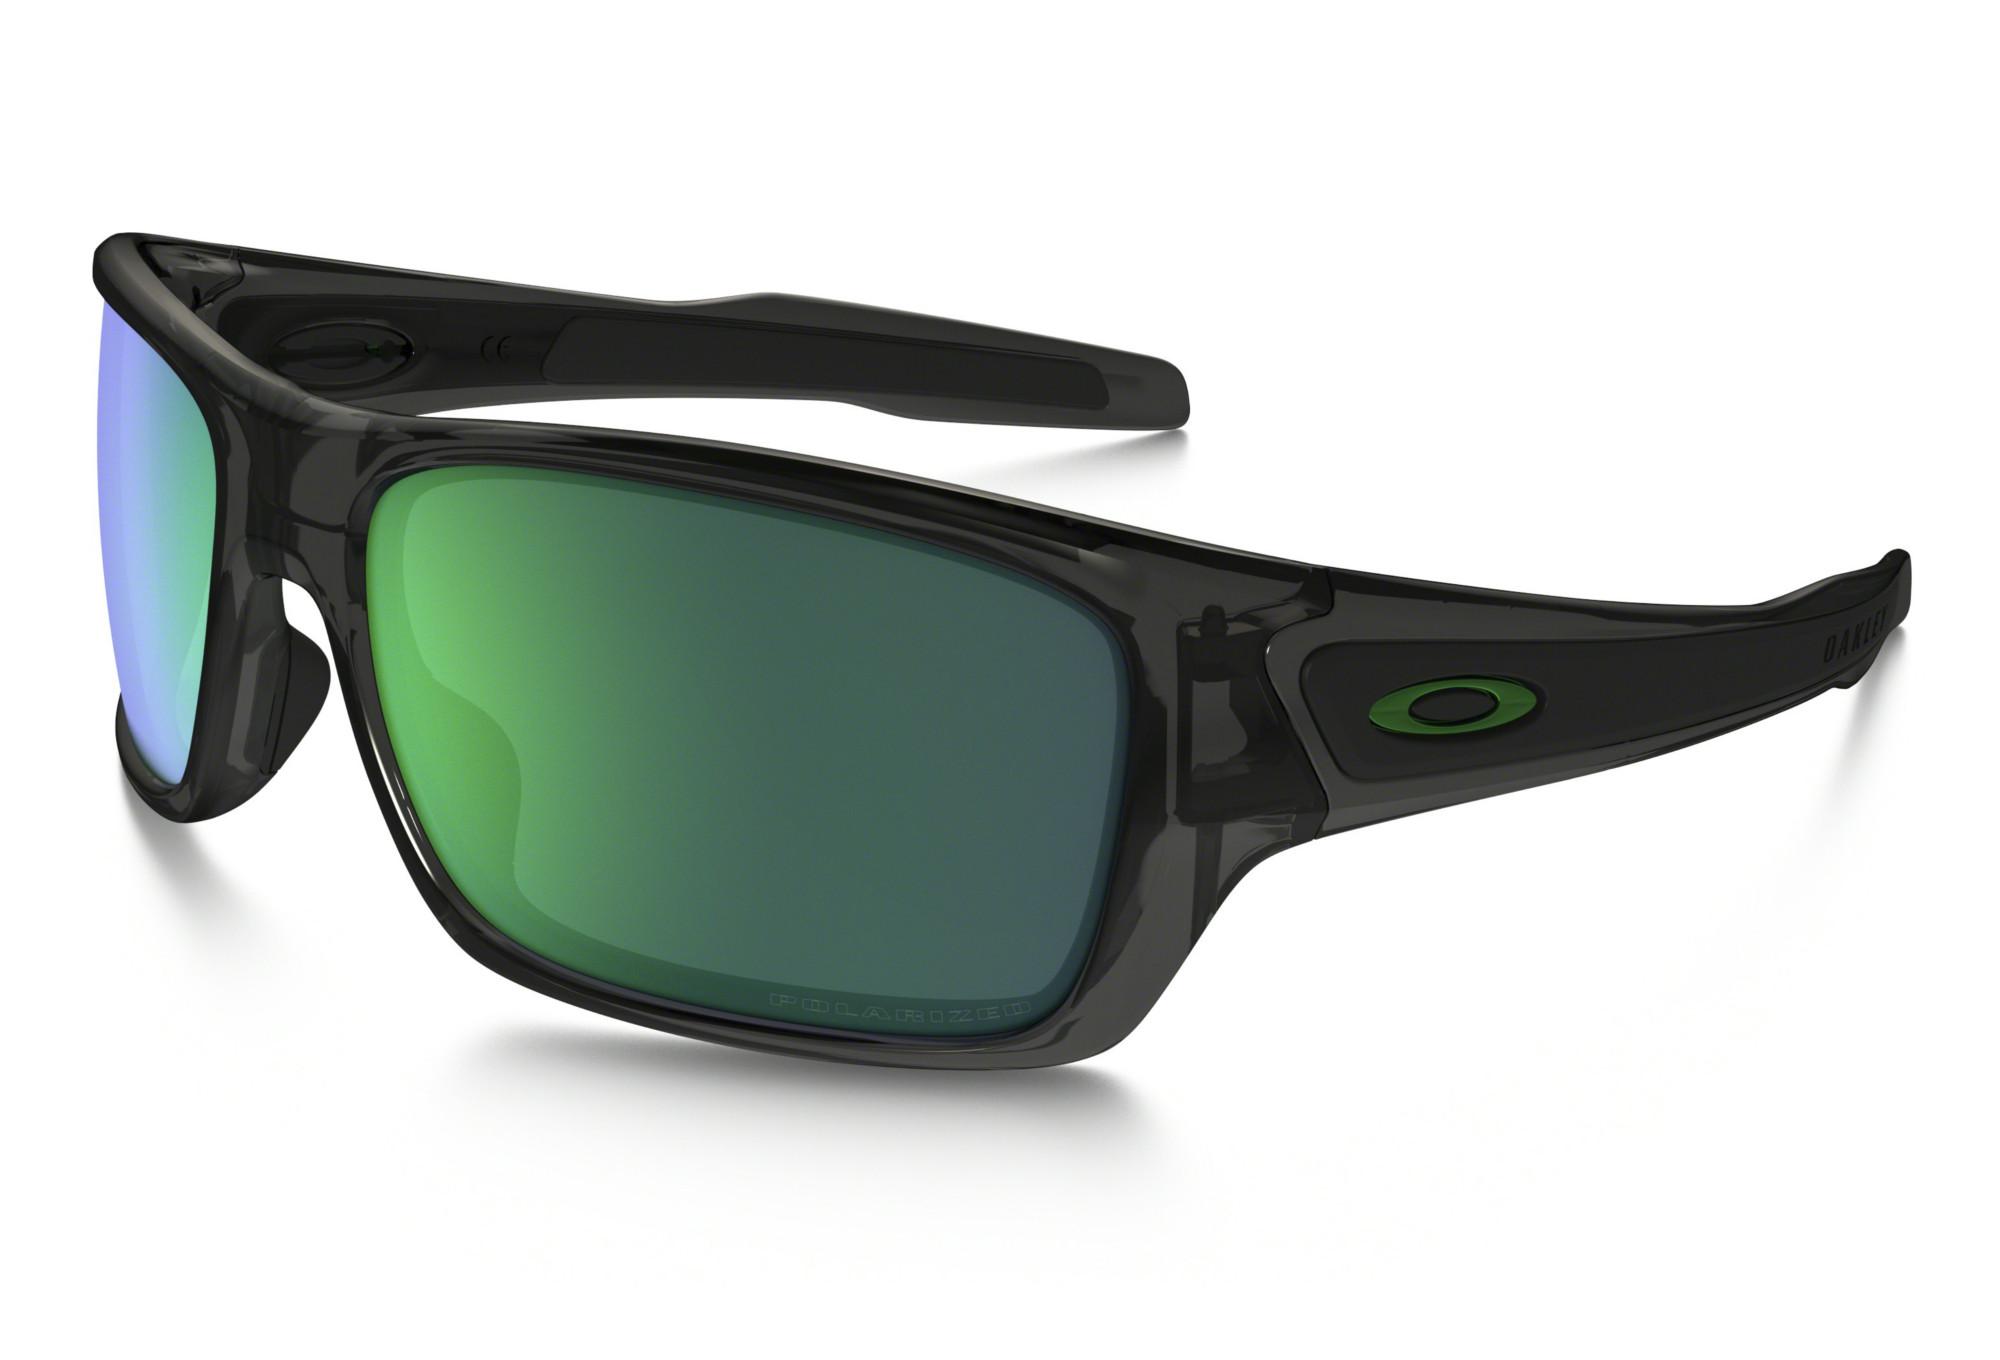 50f17daeaba OAKLEY Sunglasses Turbine Grey Smoke Jade Iridium Polarized Ref  OO9263-09